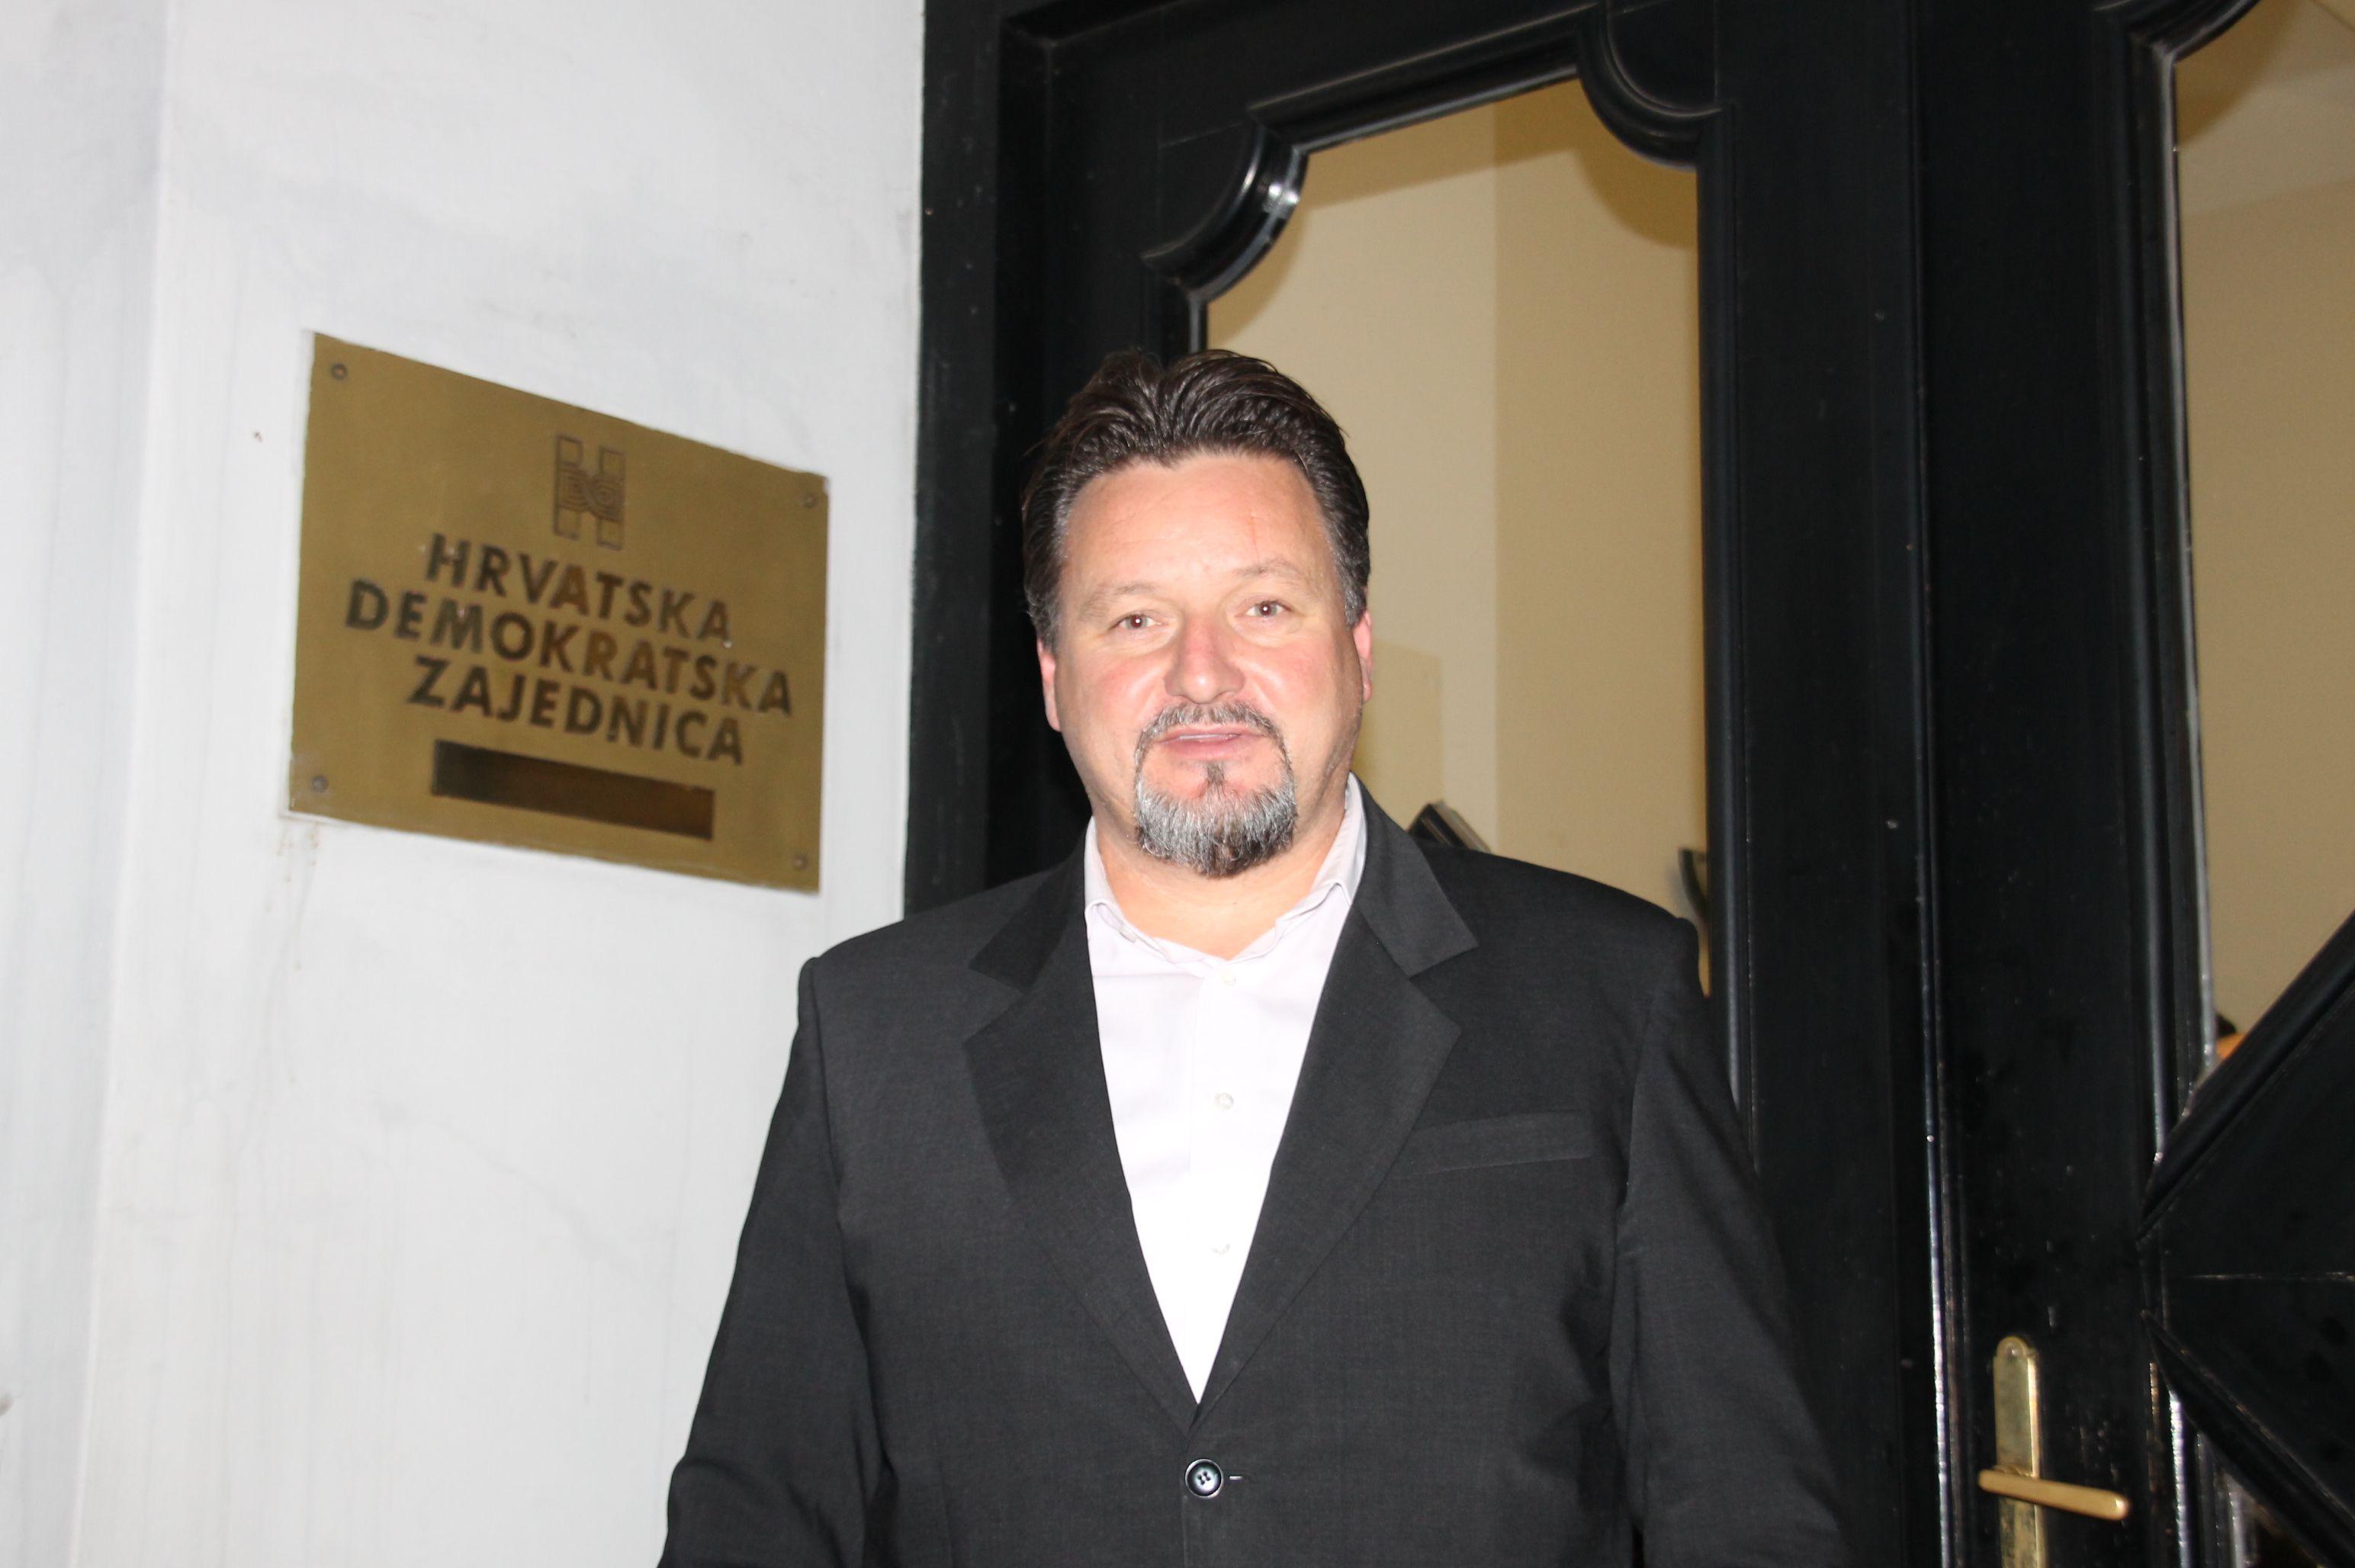 Uskok i službeno pokrenuo istragu protiv bivšeg ministra uprave HDZ zastupnika Lovre Kuščevića